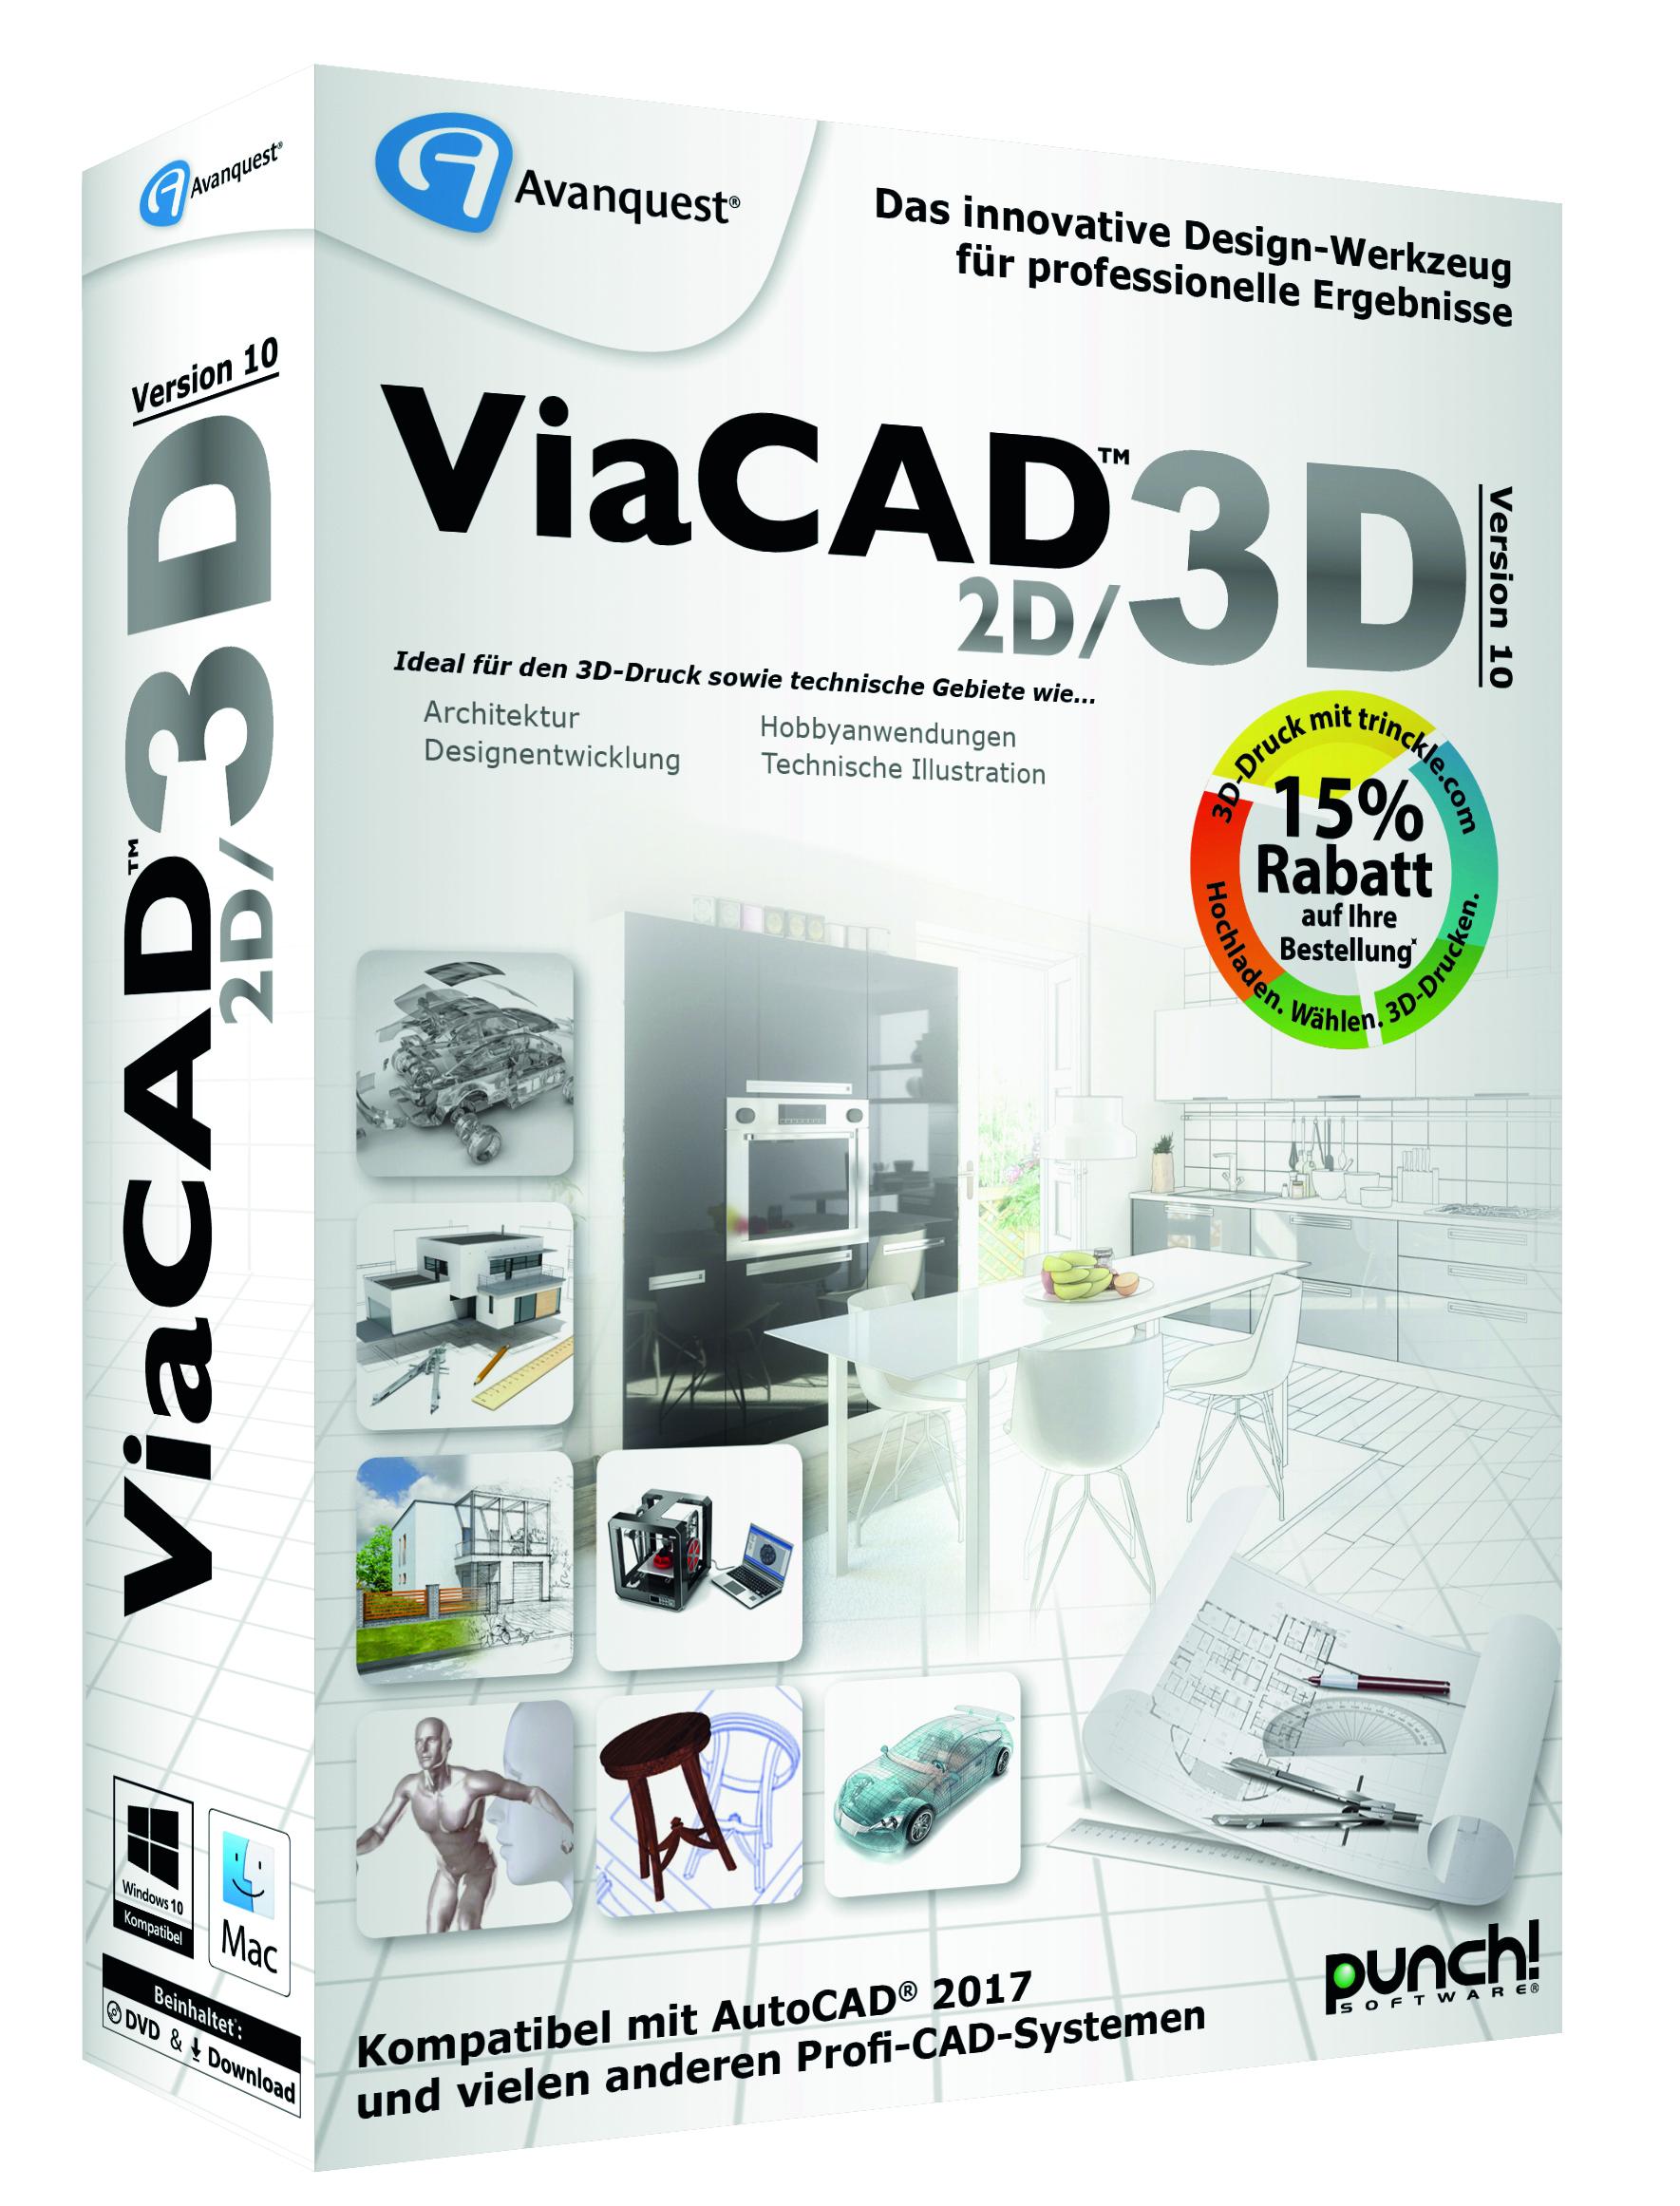 ViaCAD 2D 3D 10 Trinckle 3D links 300dpi CMYK